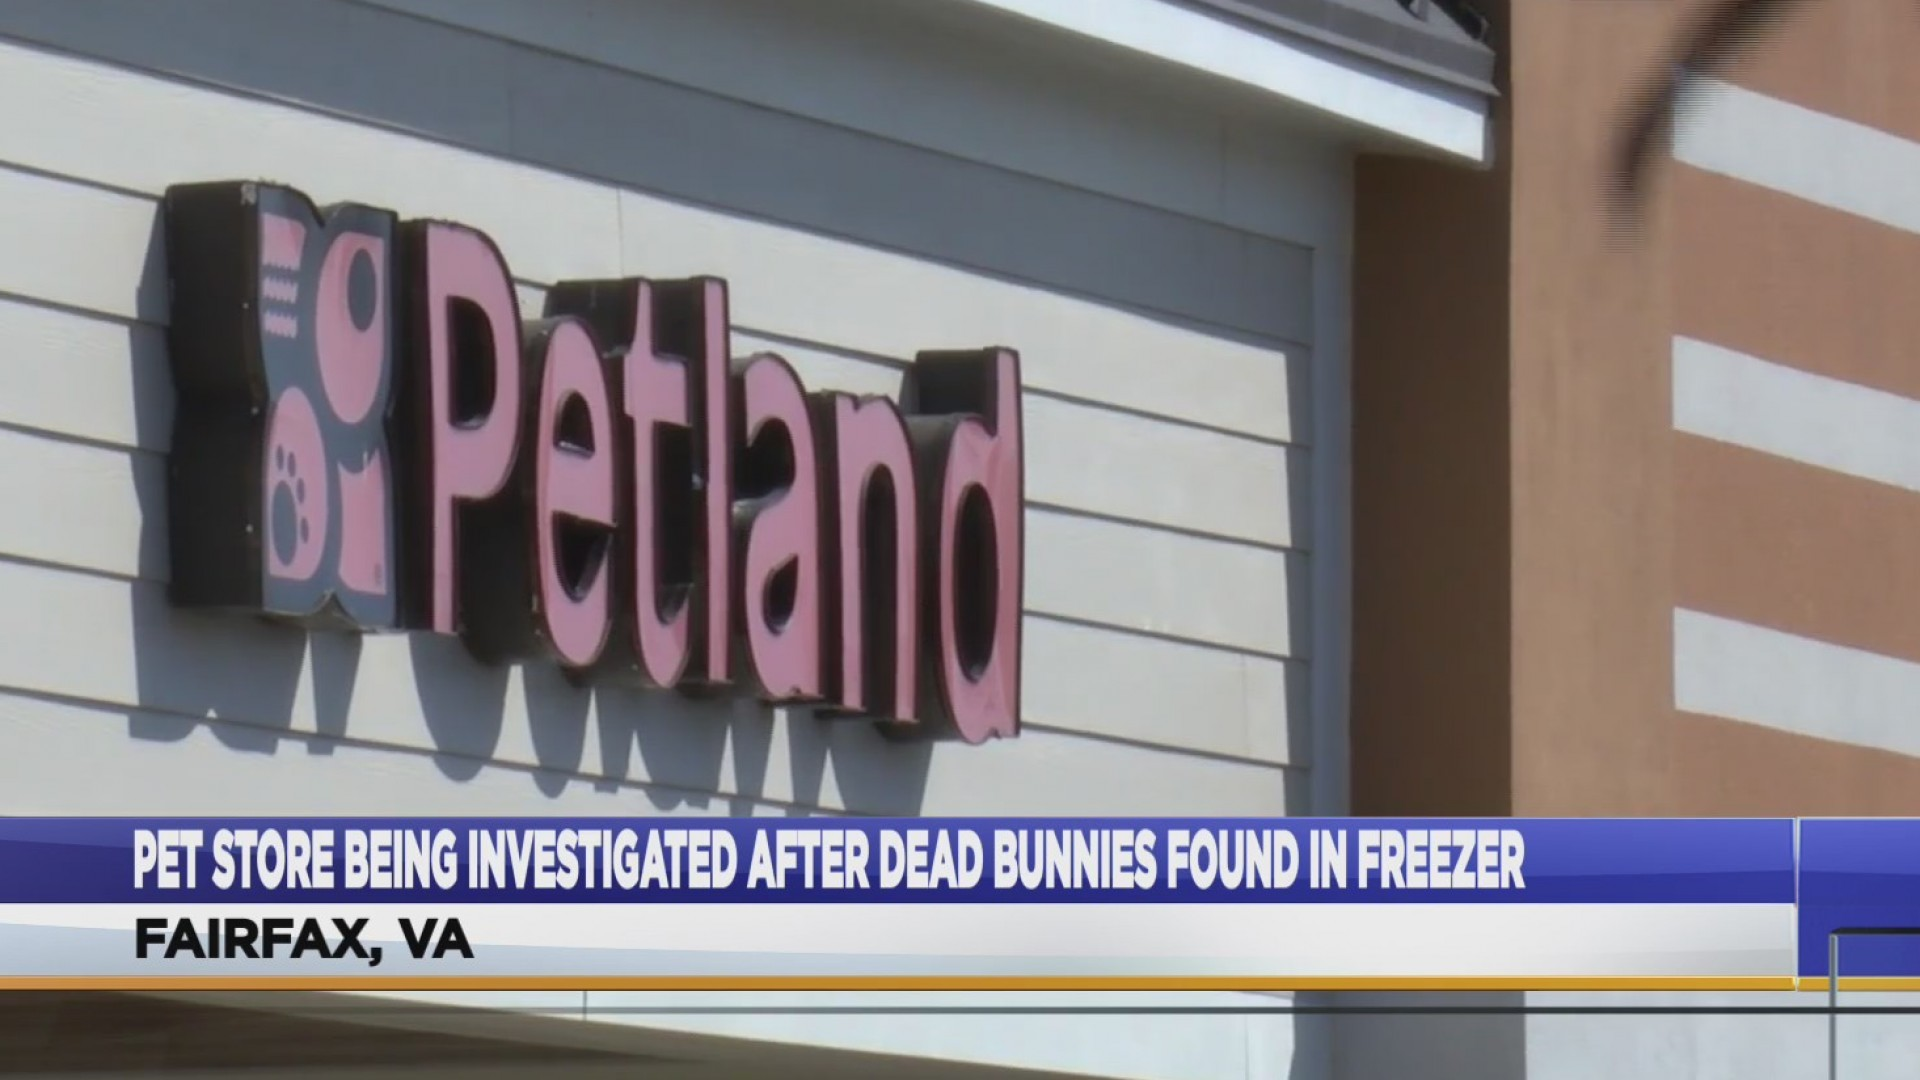 Fairfax's Petland is under investigation after 14 rabbits